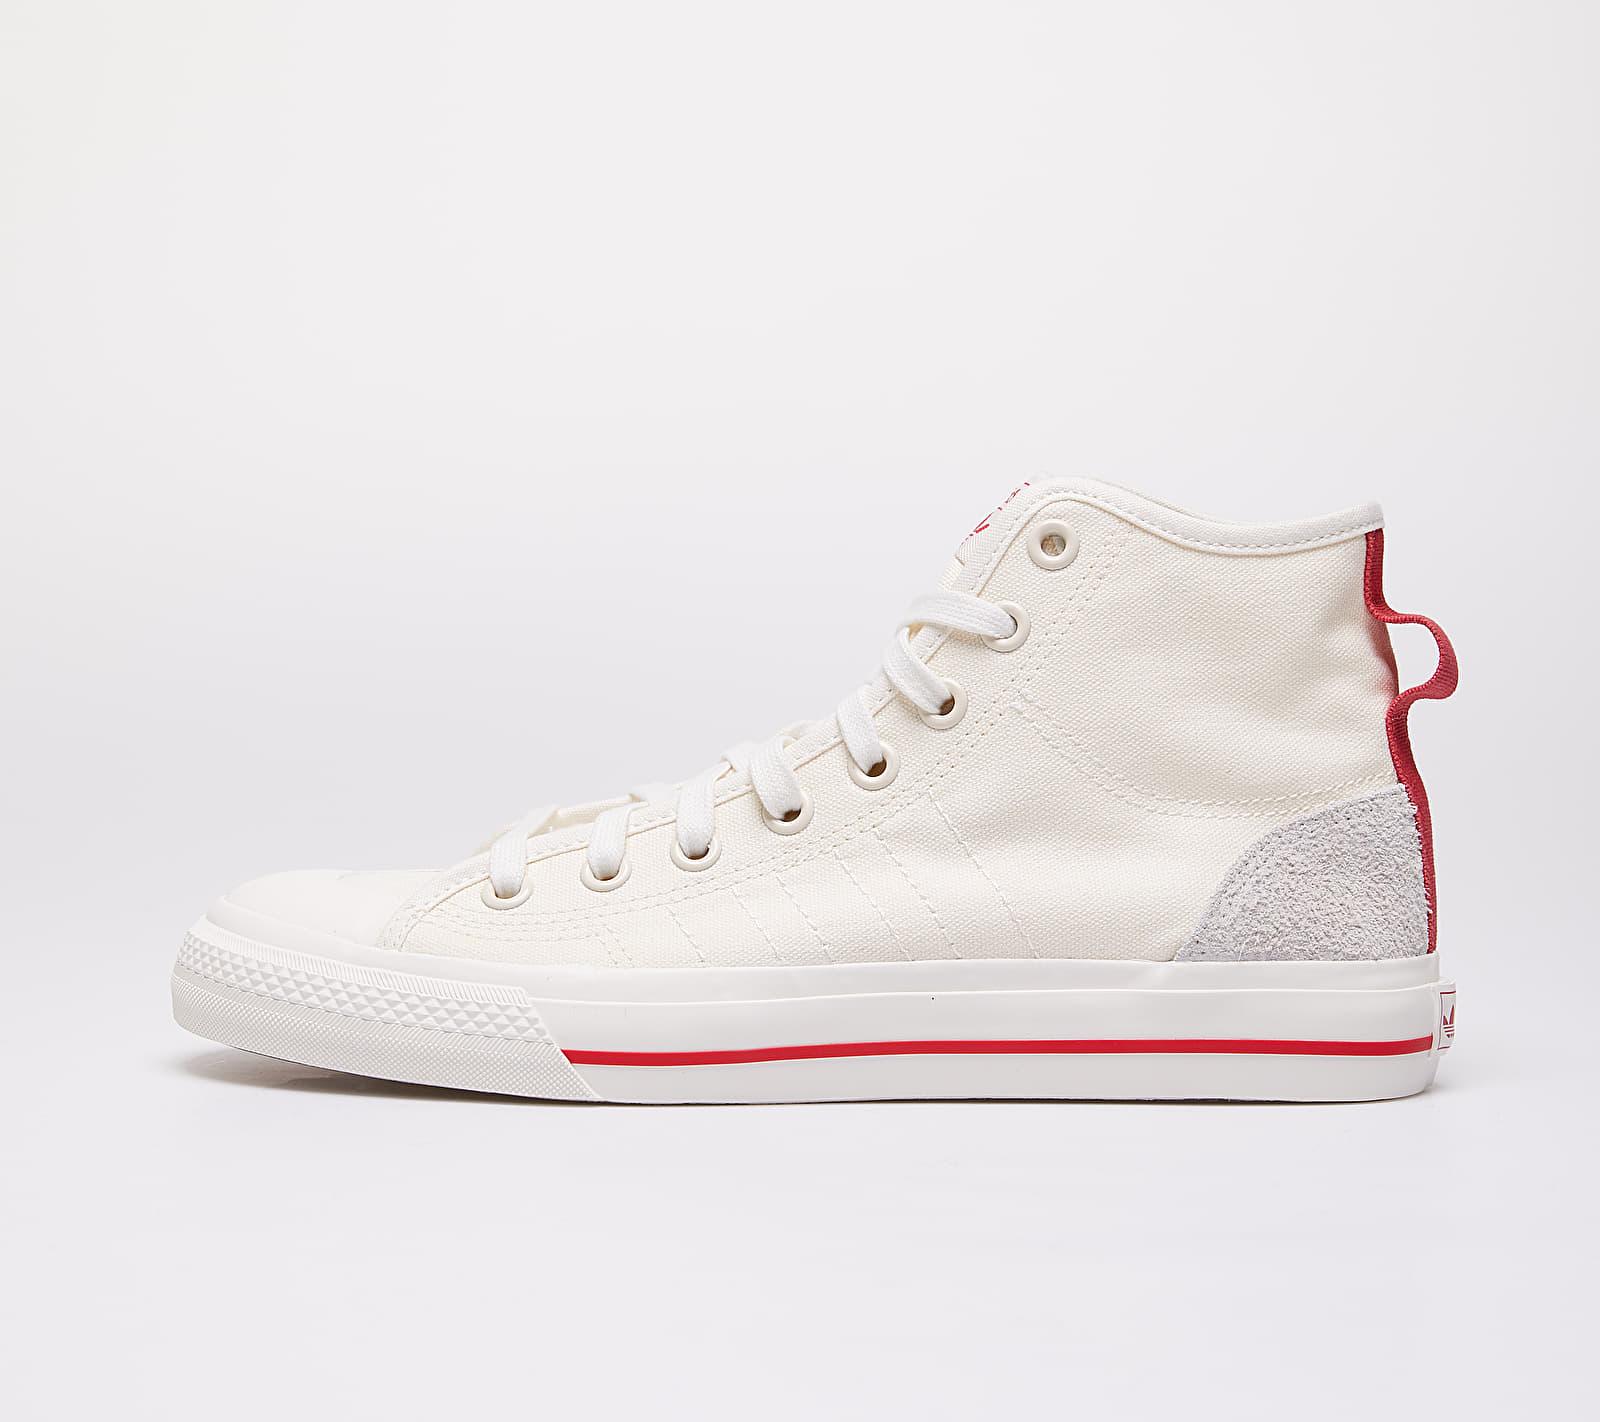 adidas Nizza Hi Rf Off White/ Glow Red/ Gum44 EUR 47 1/3